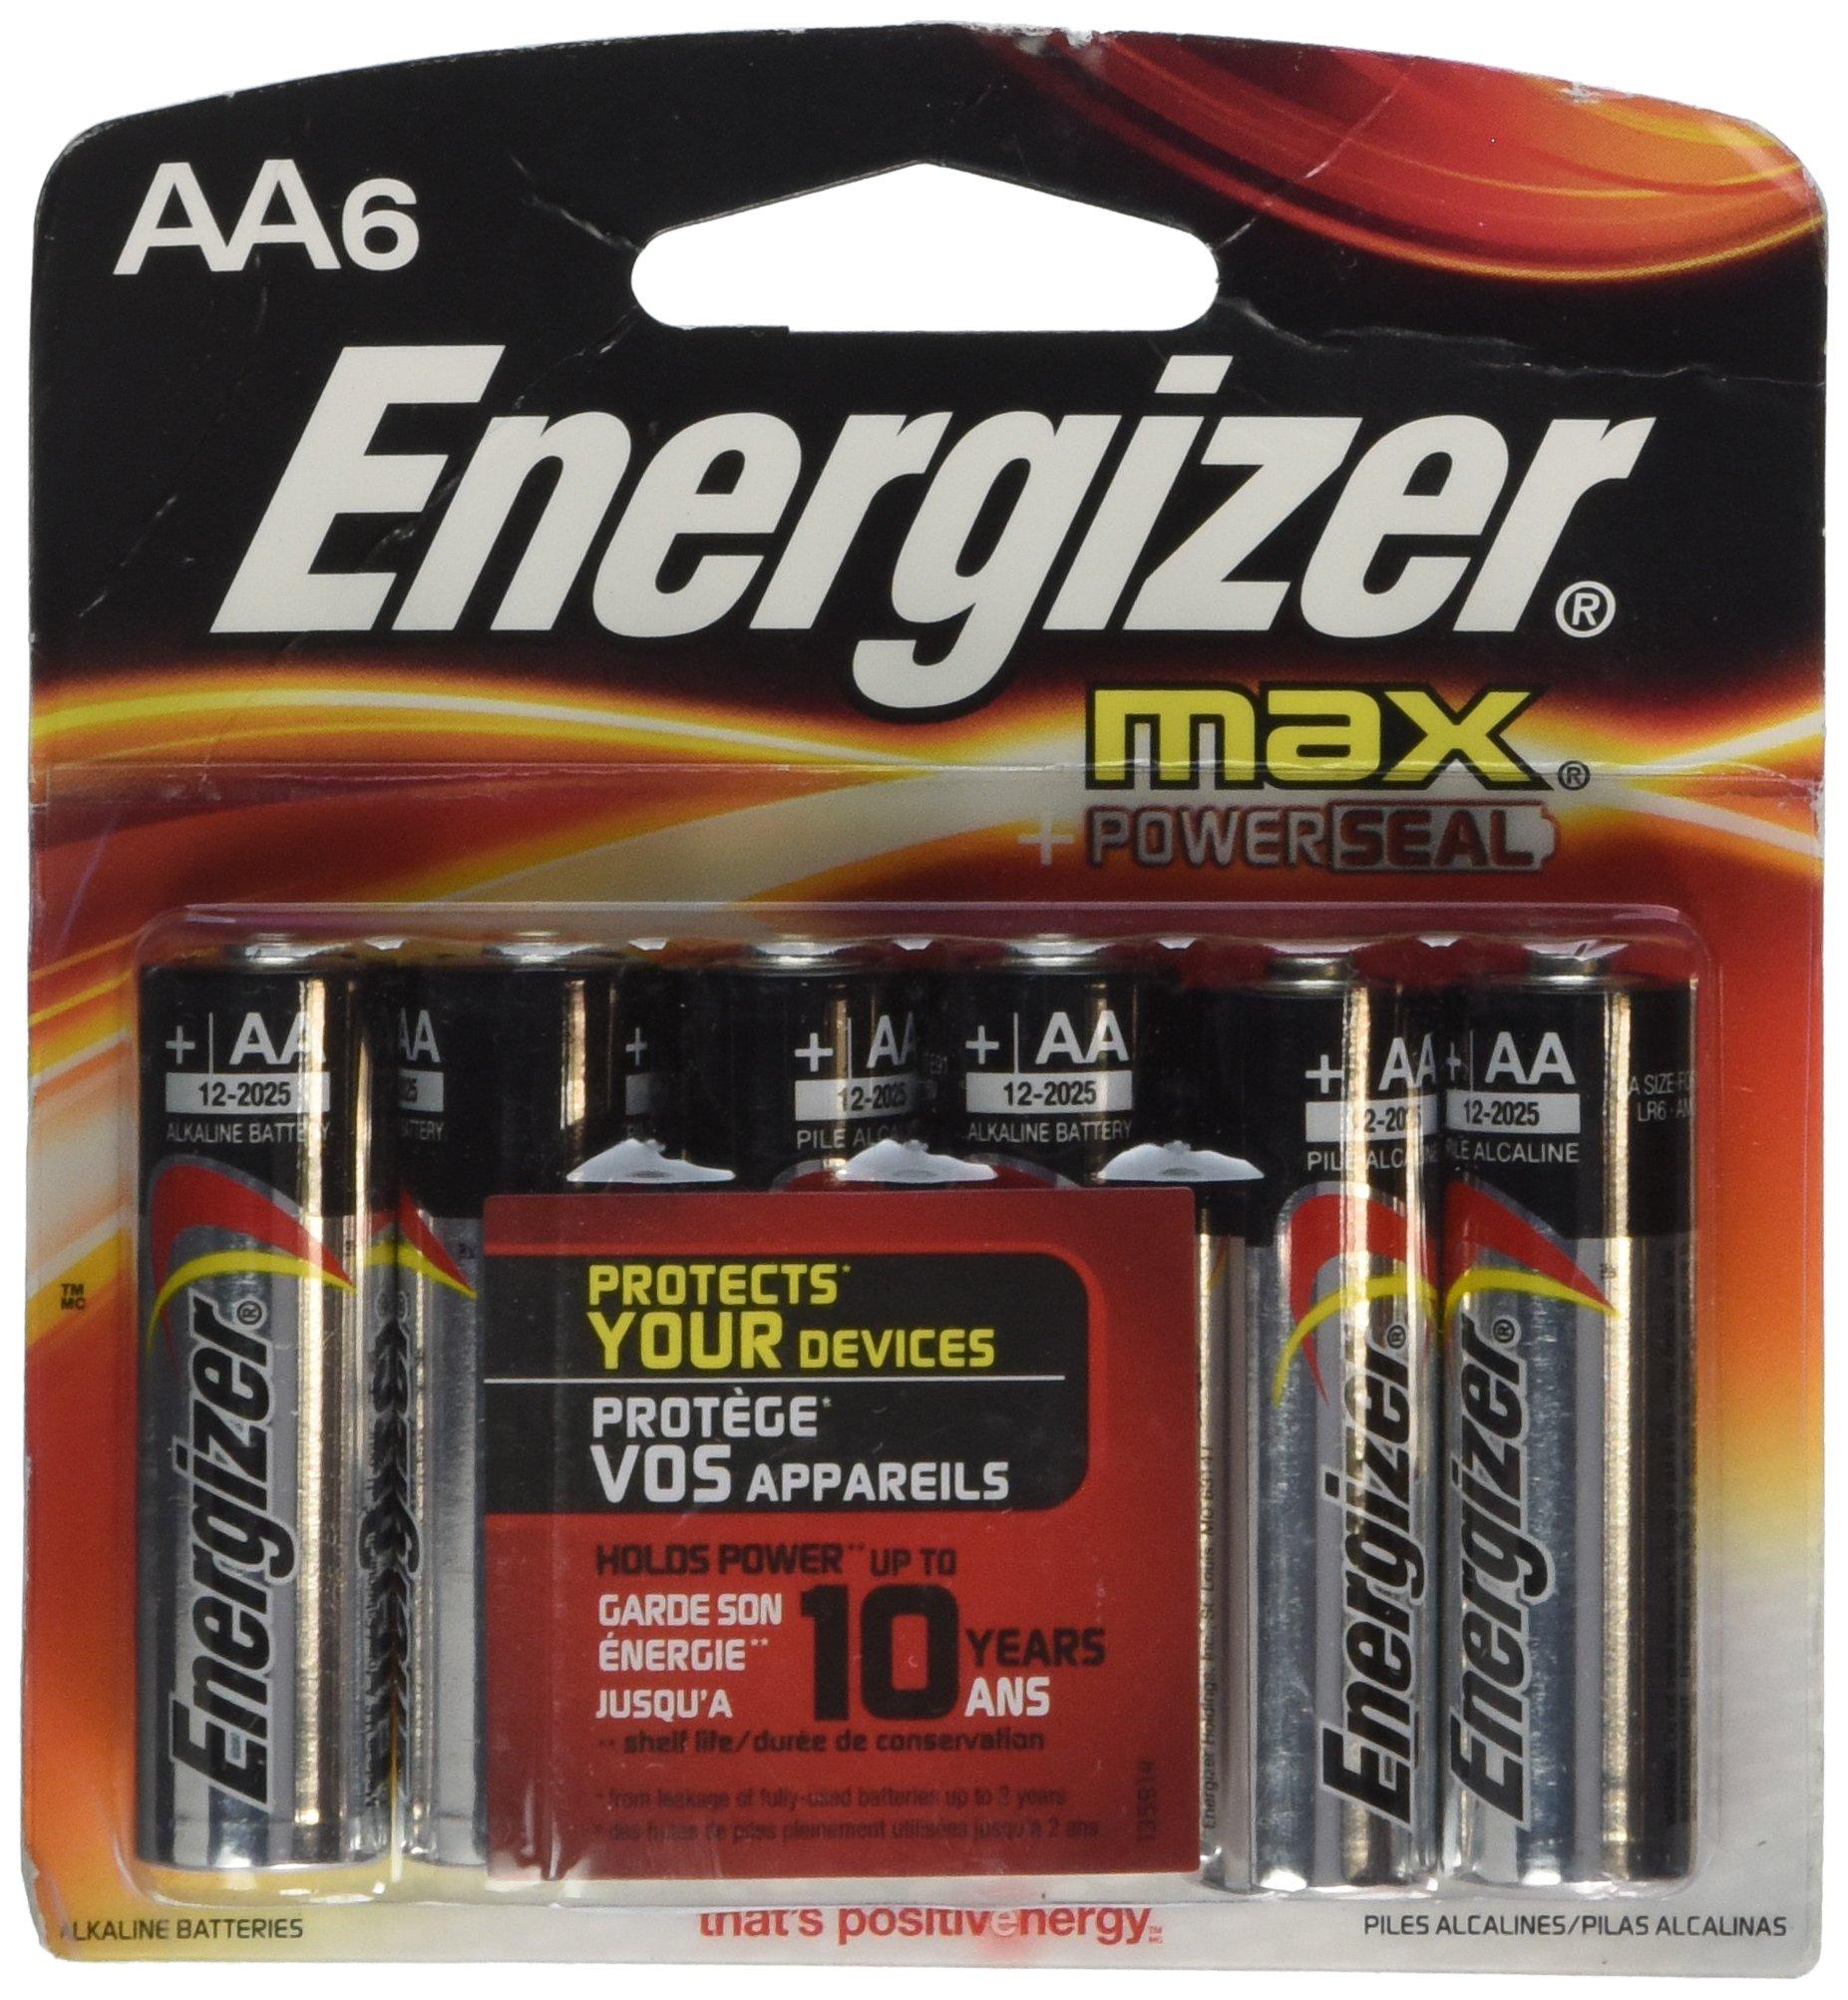 Energizer 06470 - AA Cell 1.5 volt MAX Battery (6 pack) (E91BPF-6)